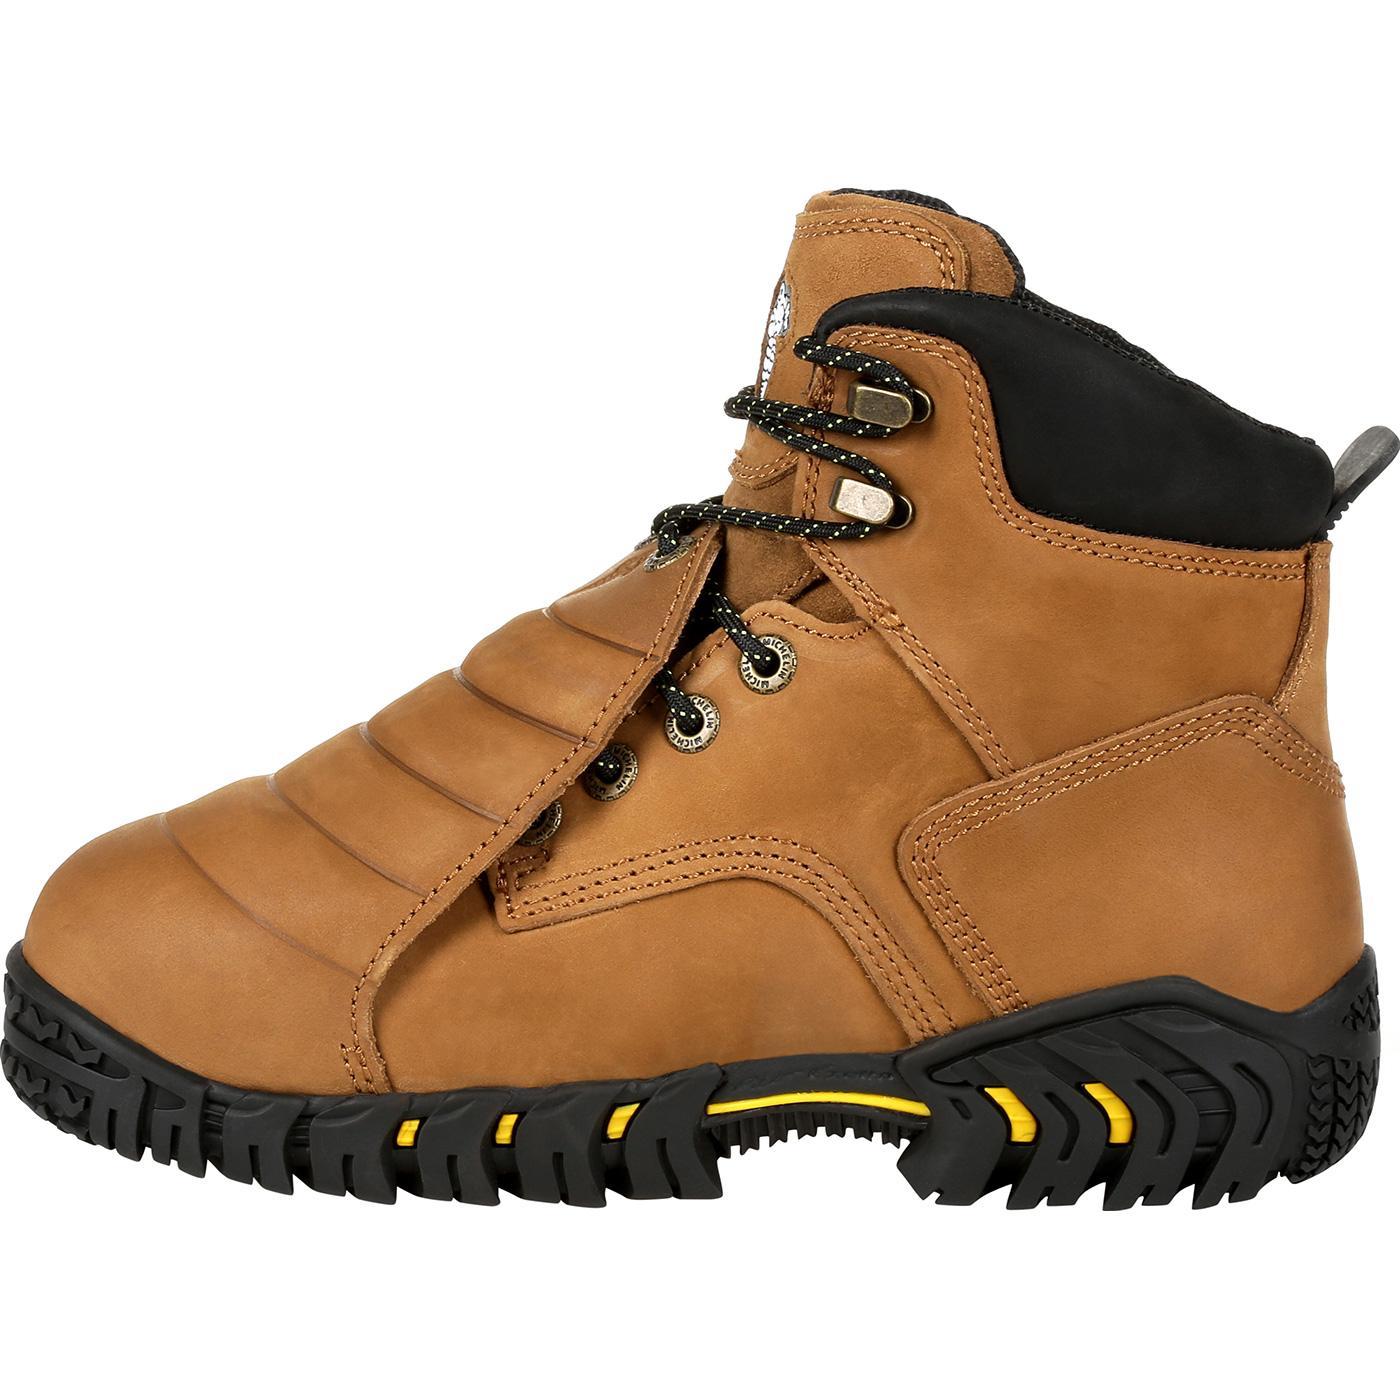 cec5a648416 Michelin® Sledge Steel Toe Metatarsal Work Boots